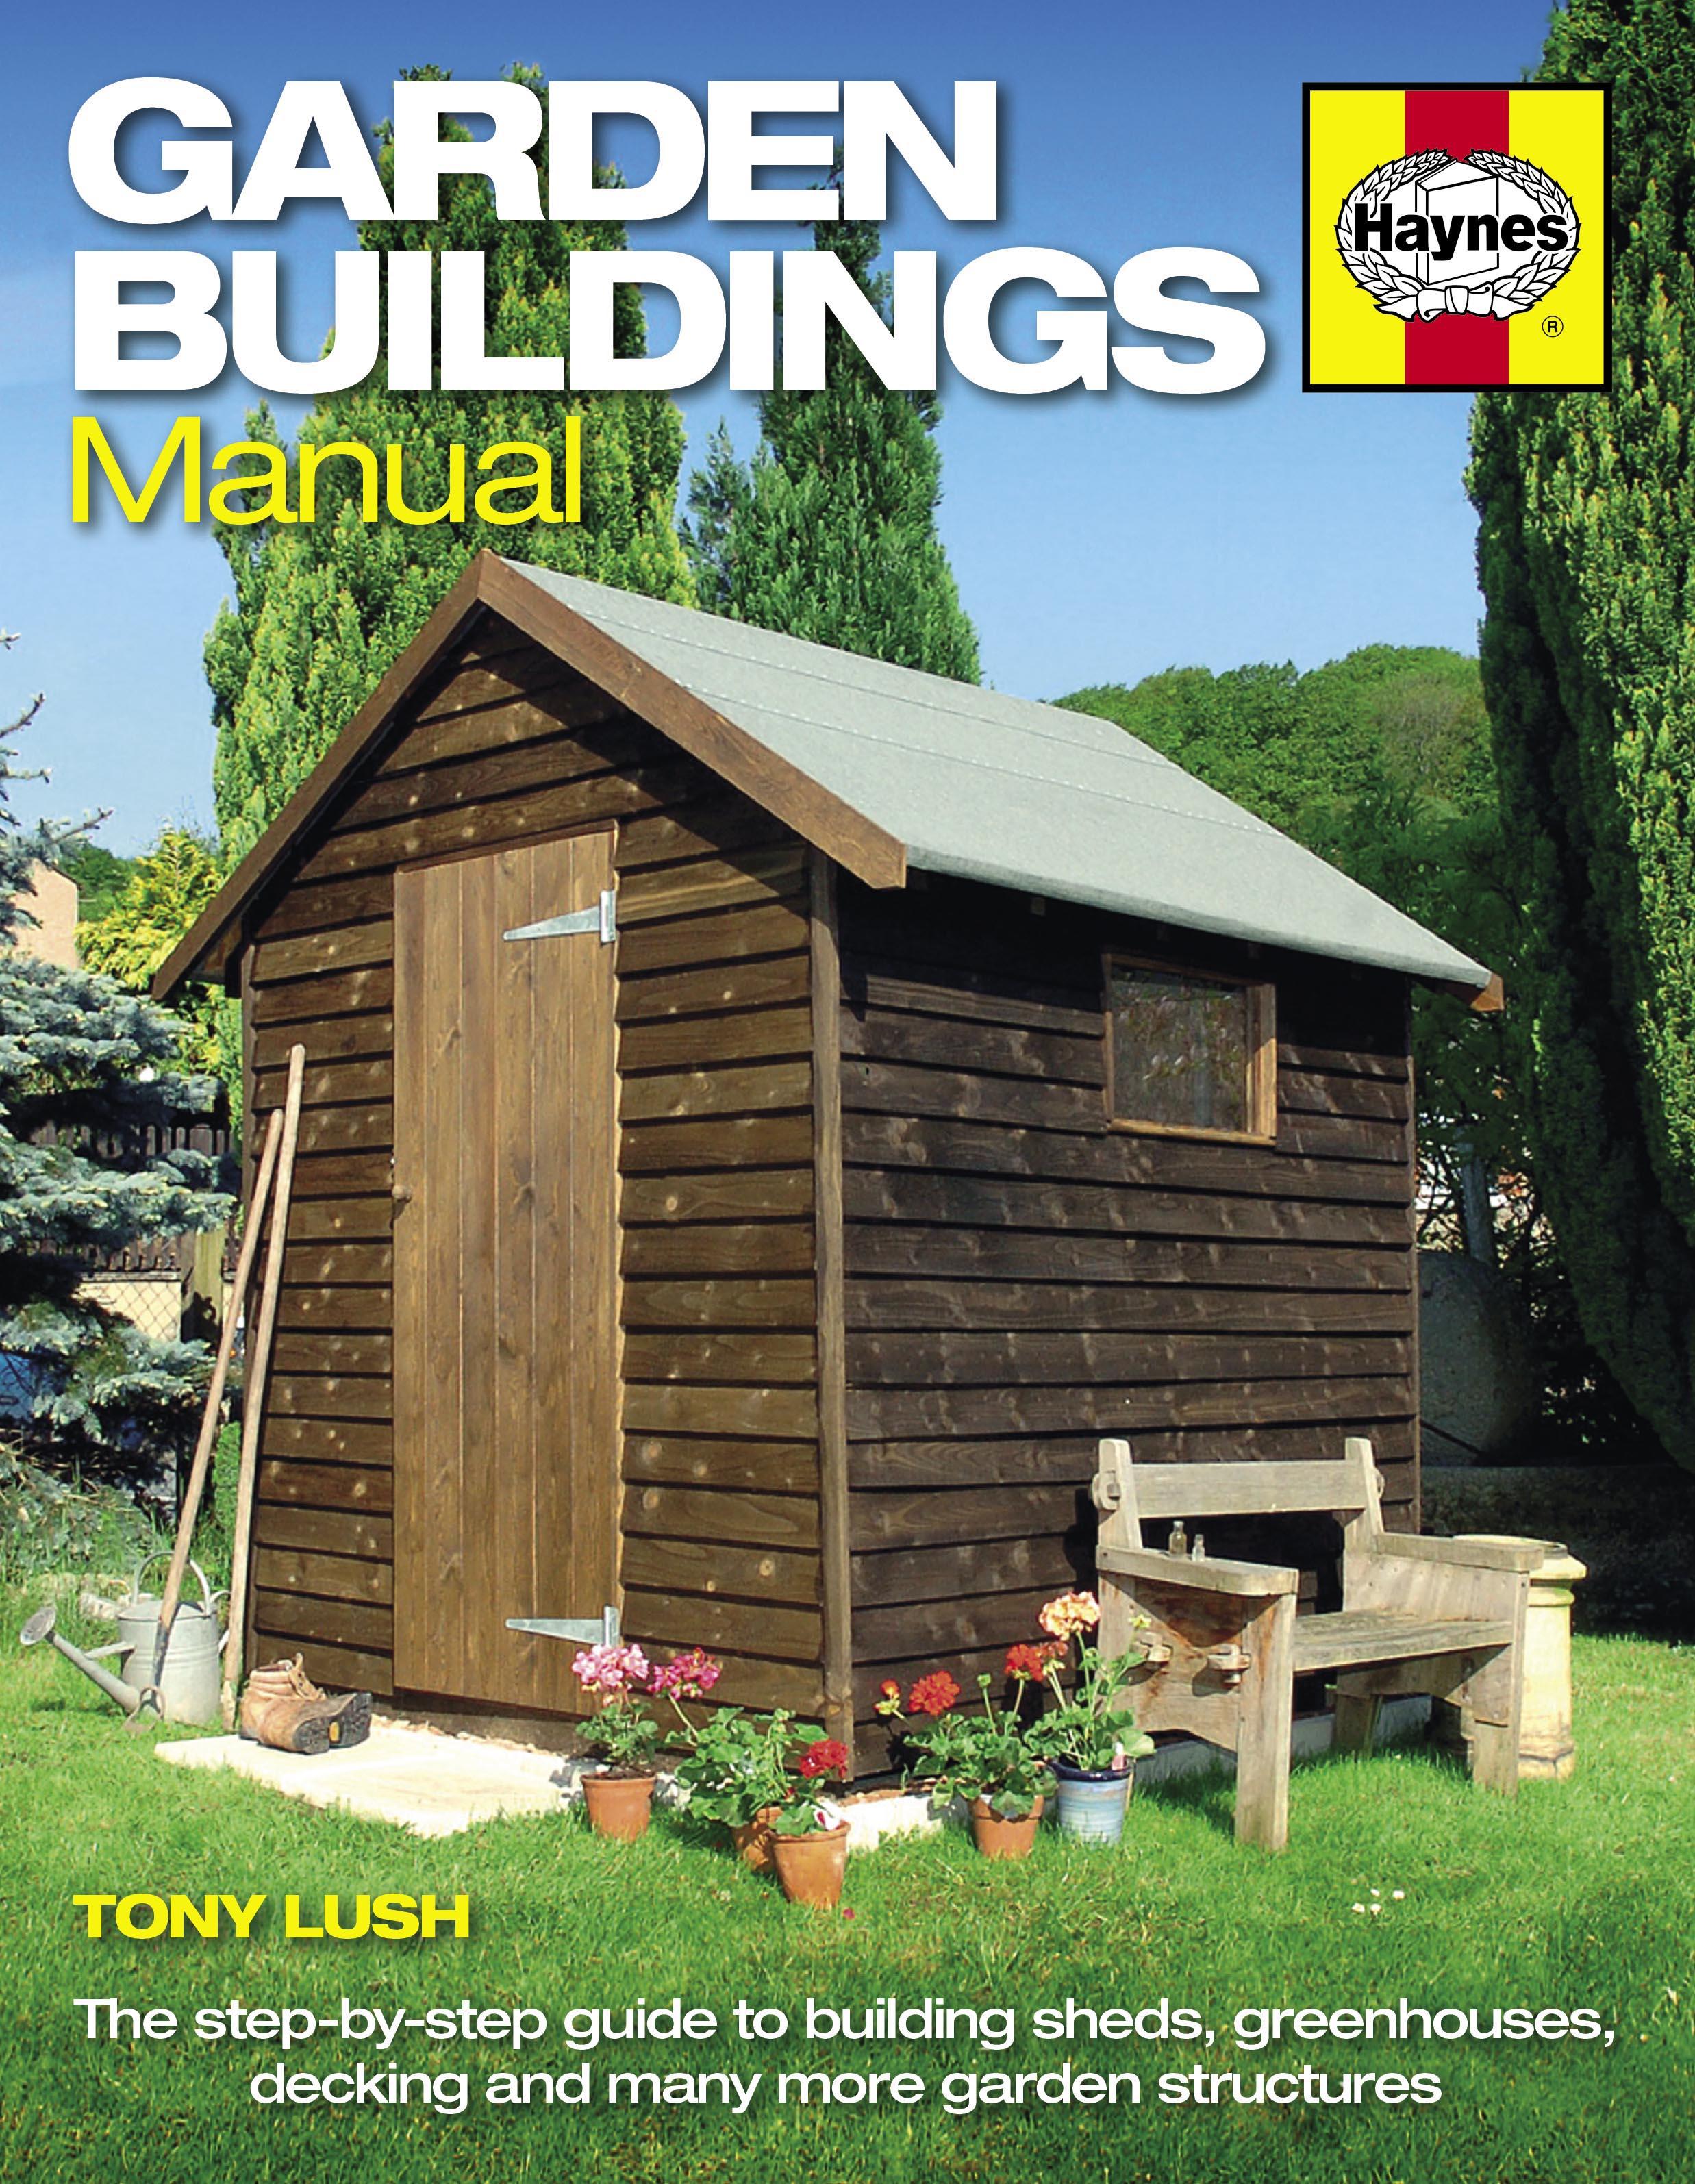 Garden Buildings Manual (paperback)